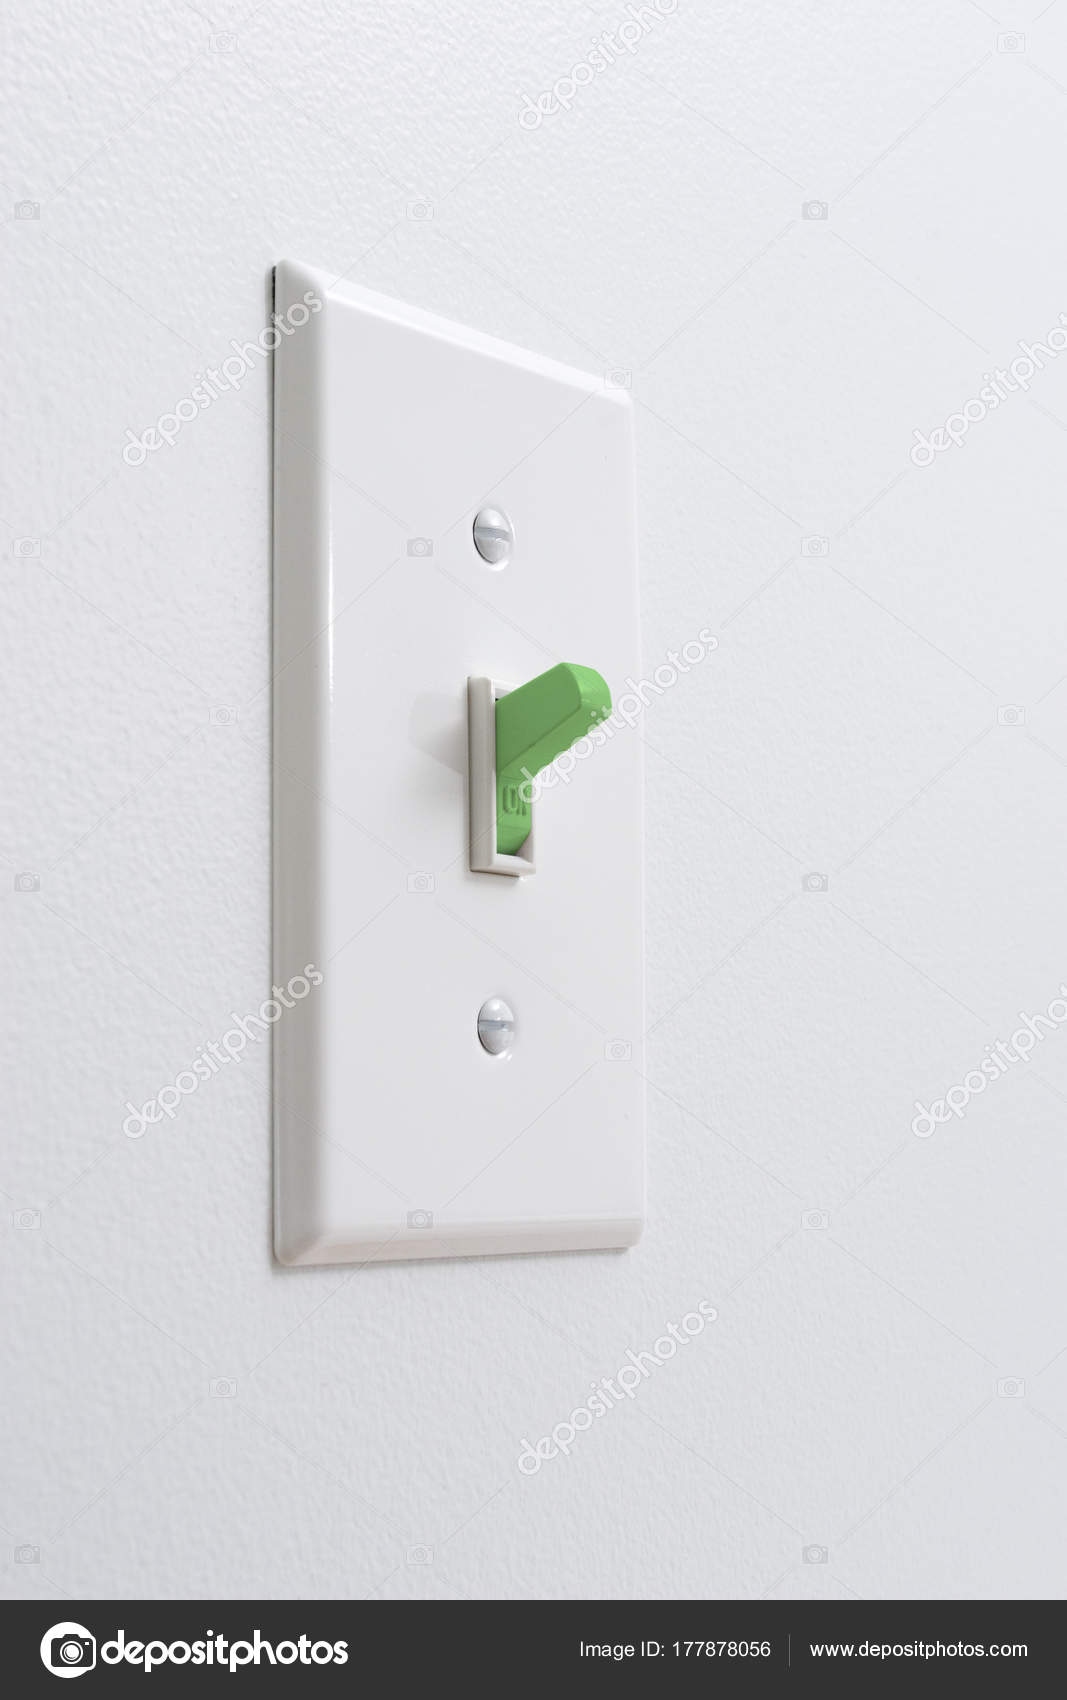 Ökostrom Lichtschalter — Stockfoto © ereidvetophoto.yahoo.com #177878056